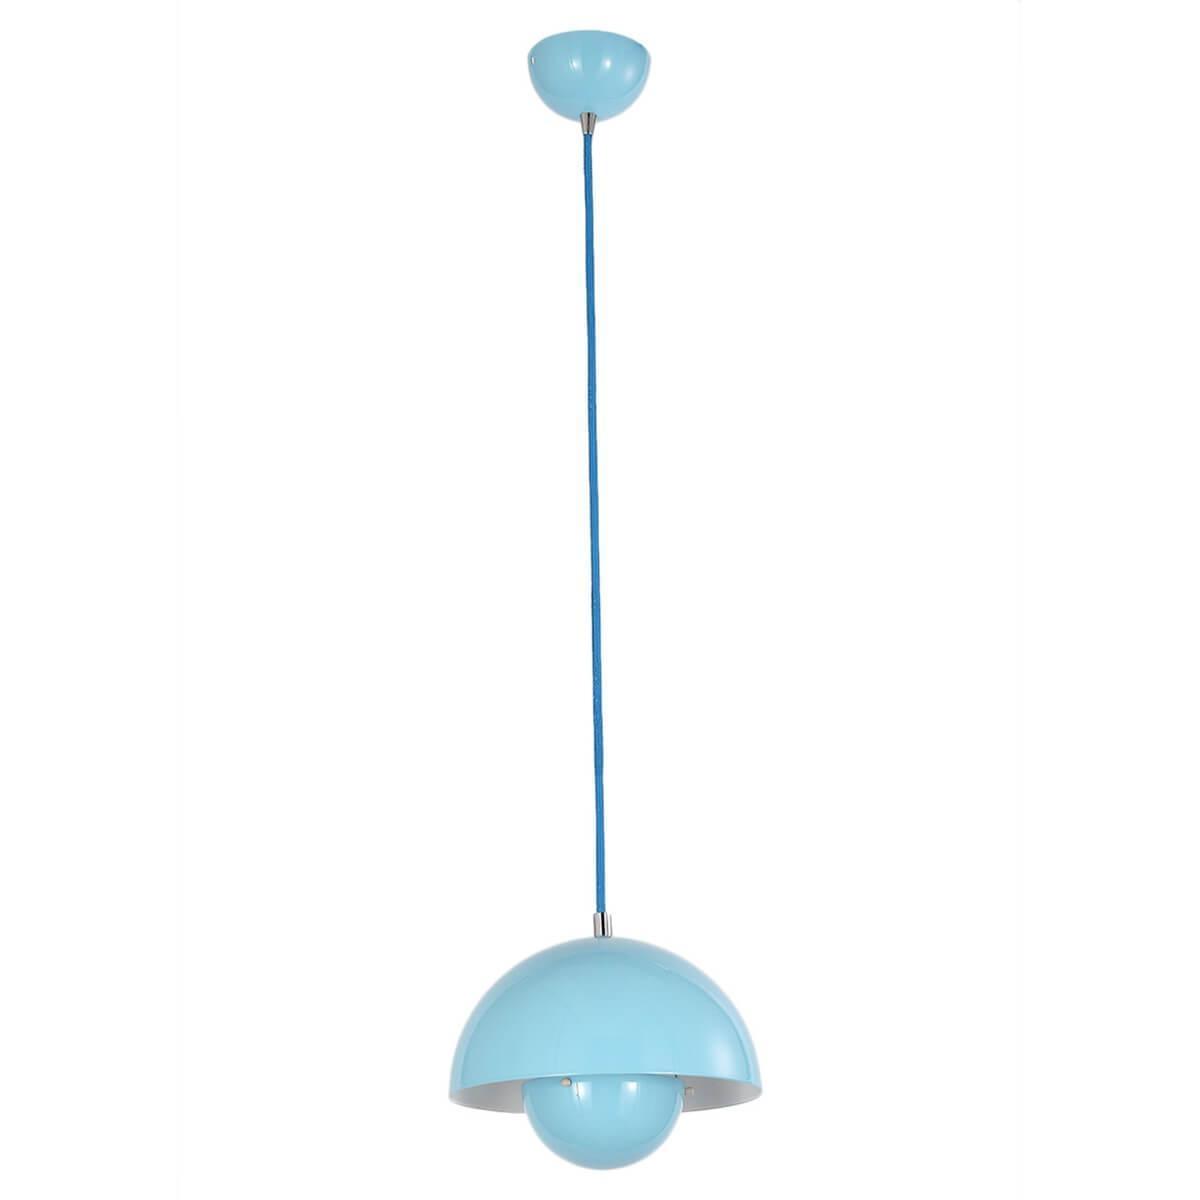 Подвесной светильник Lucia Tucci Narni 197.1 Blu